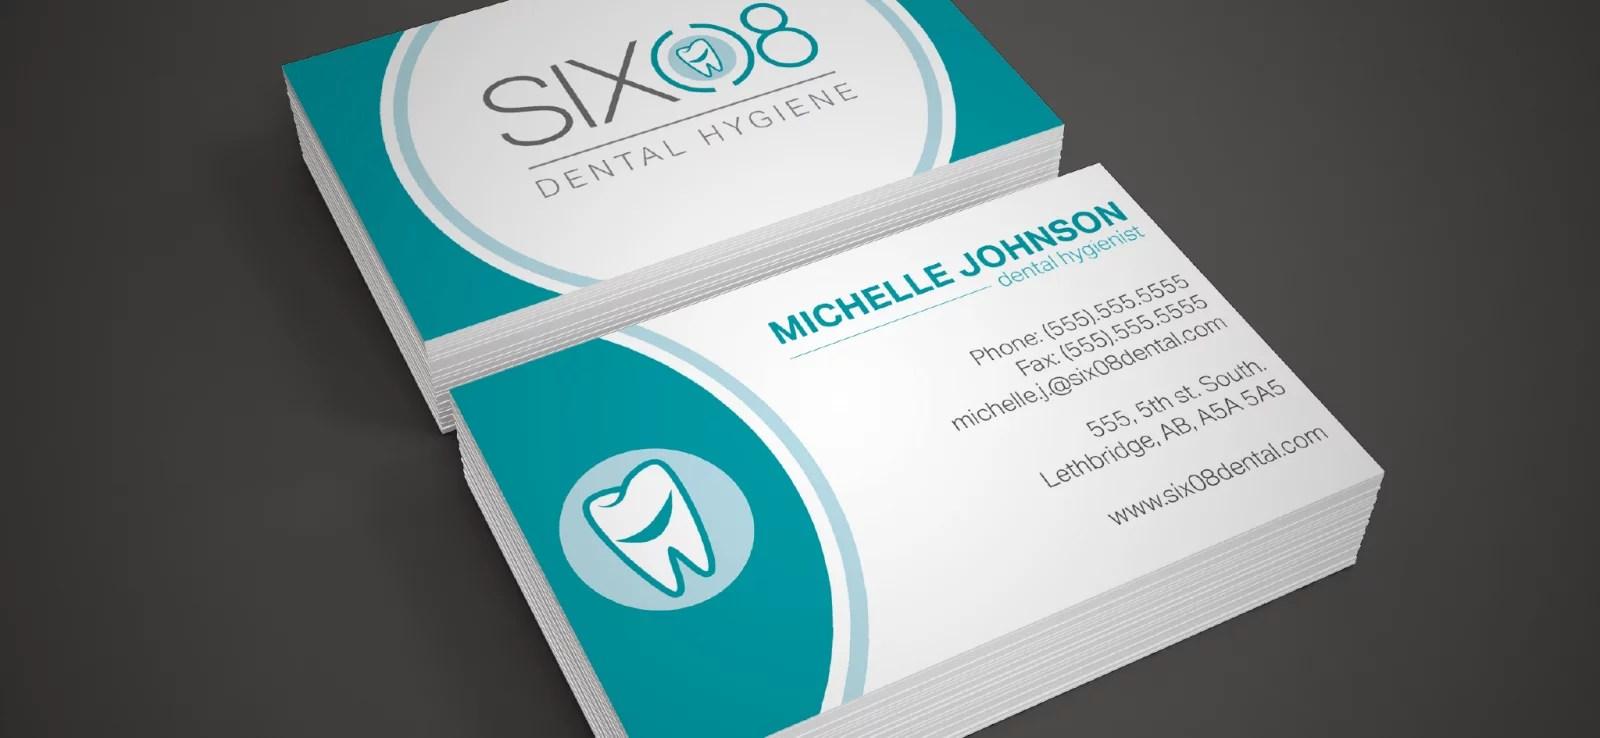 Business Card Mockup for Six 08 Dental Hygiene